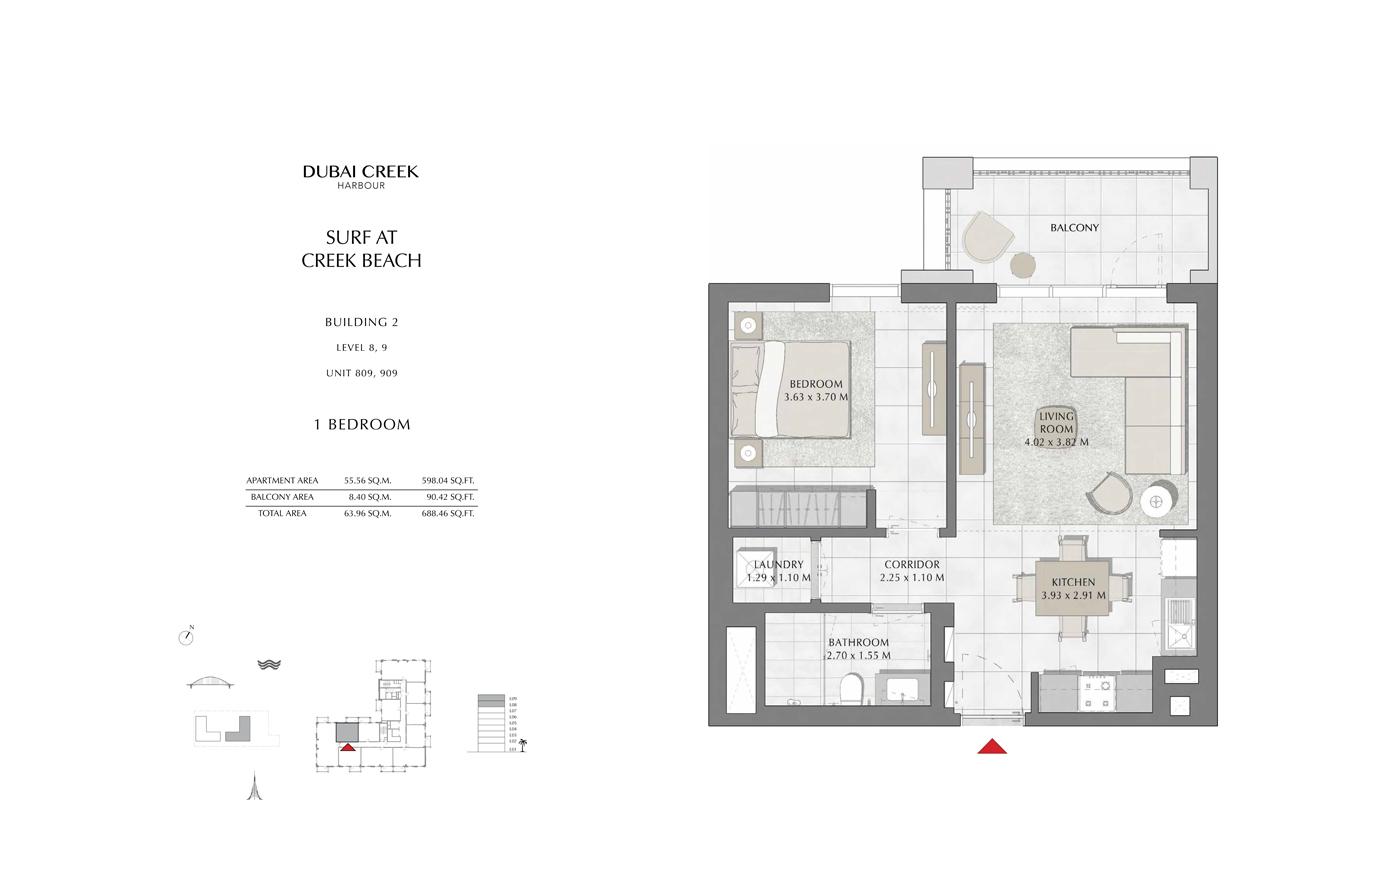 Building 2, 1 Bedroom Level 8,9, Size 688 Sq Ft